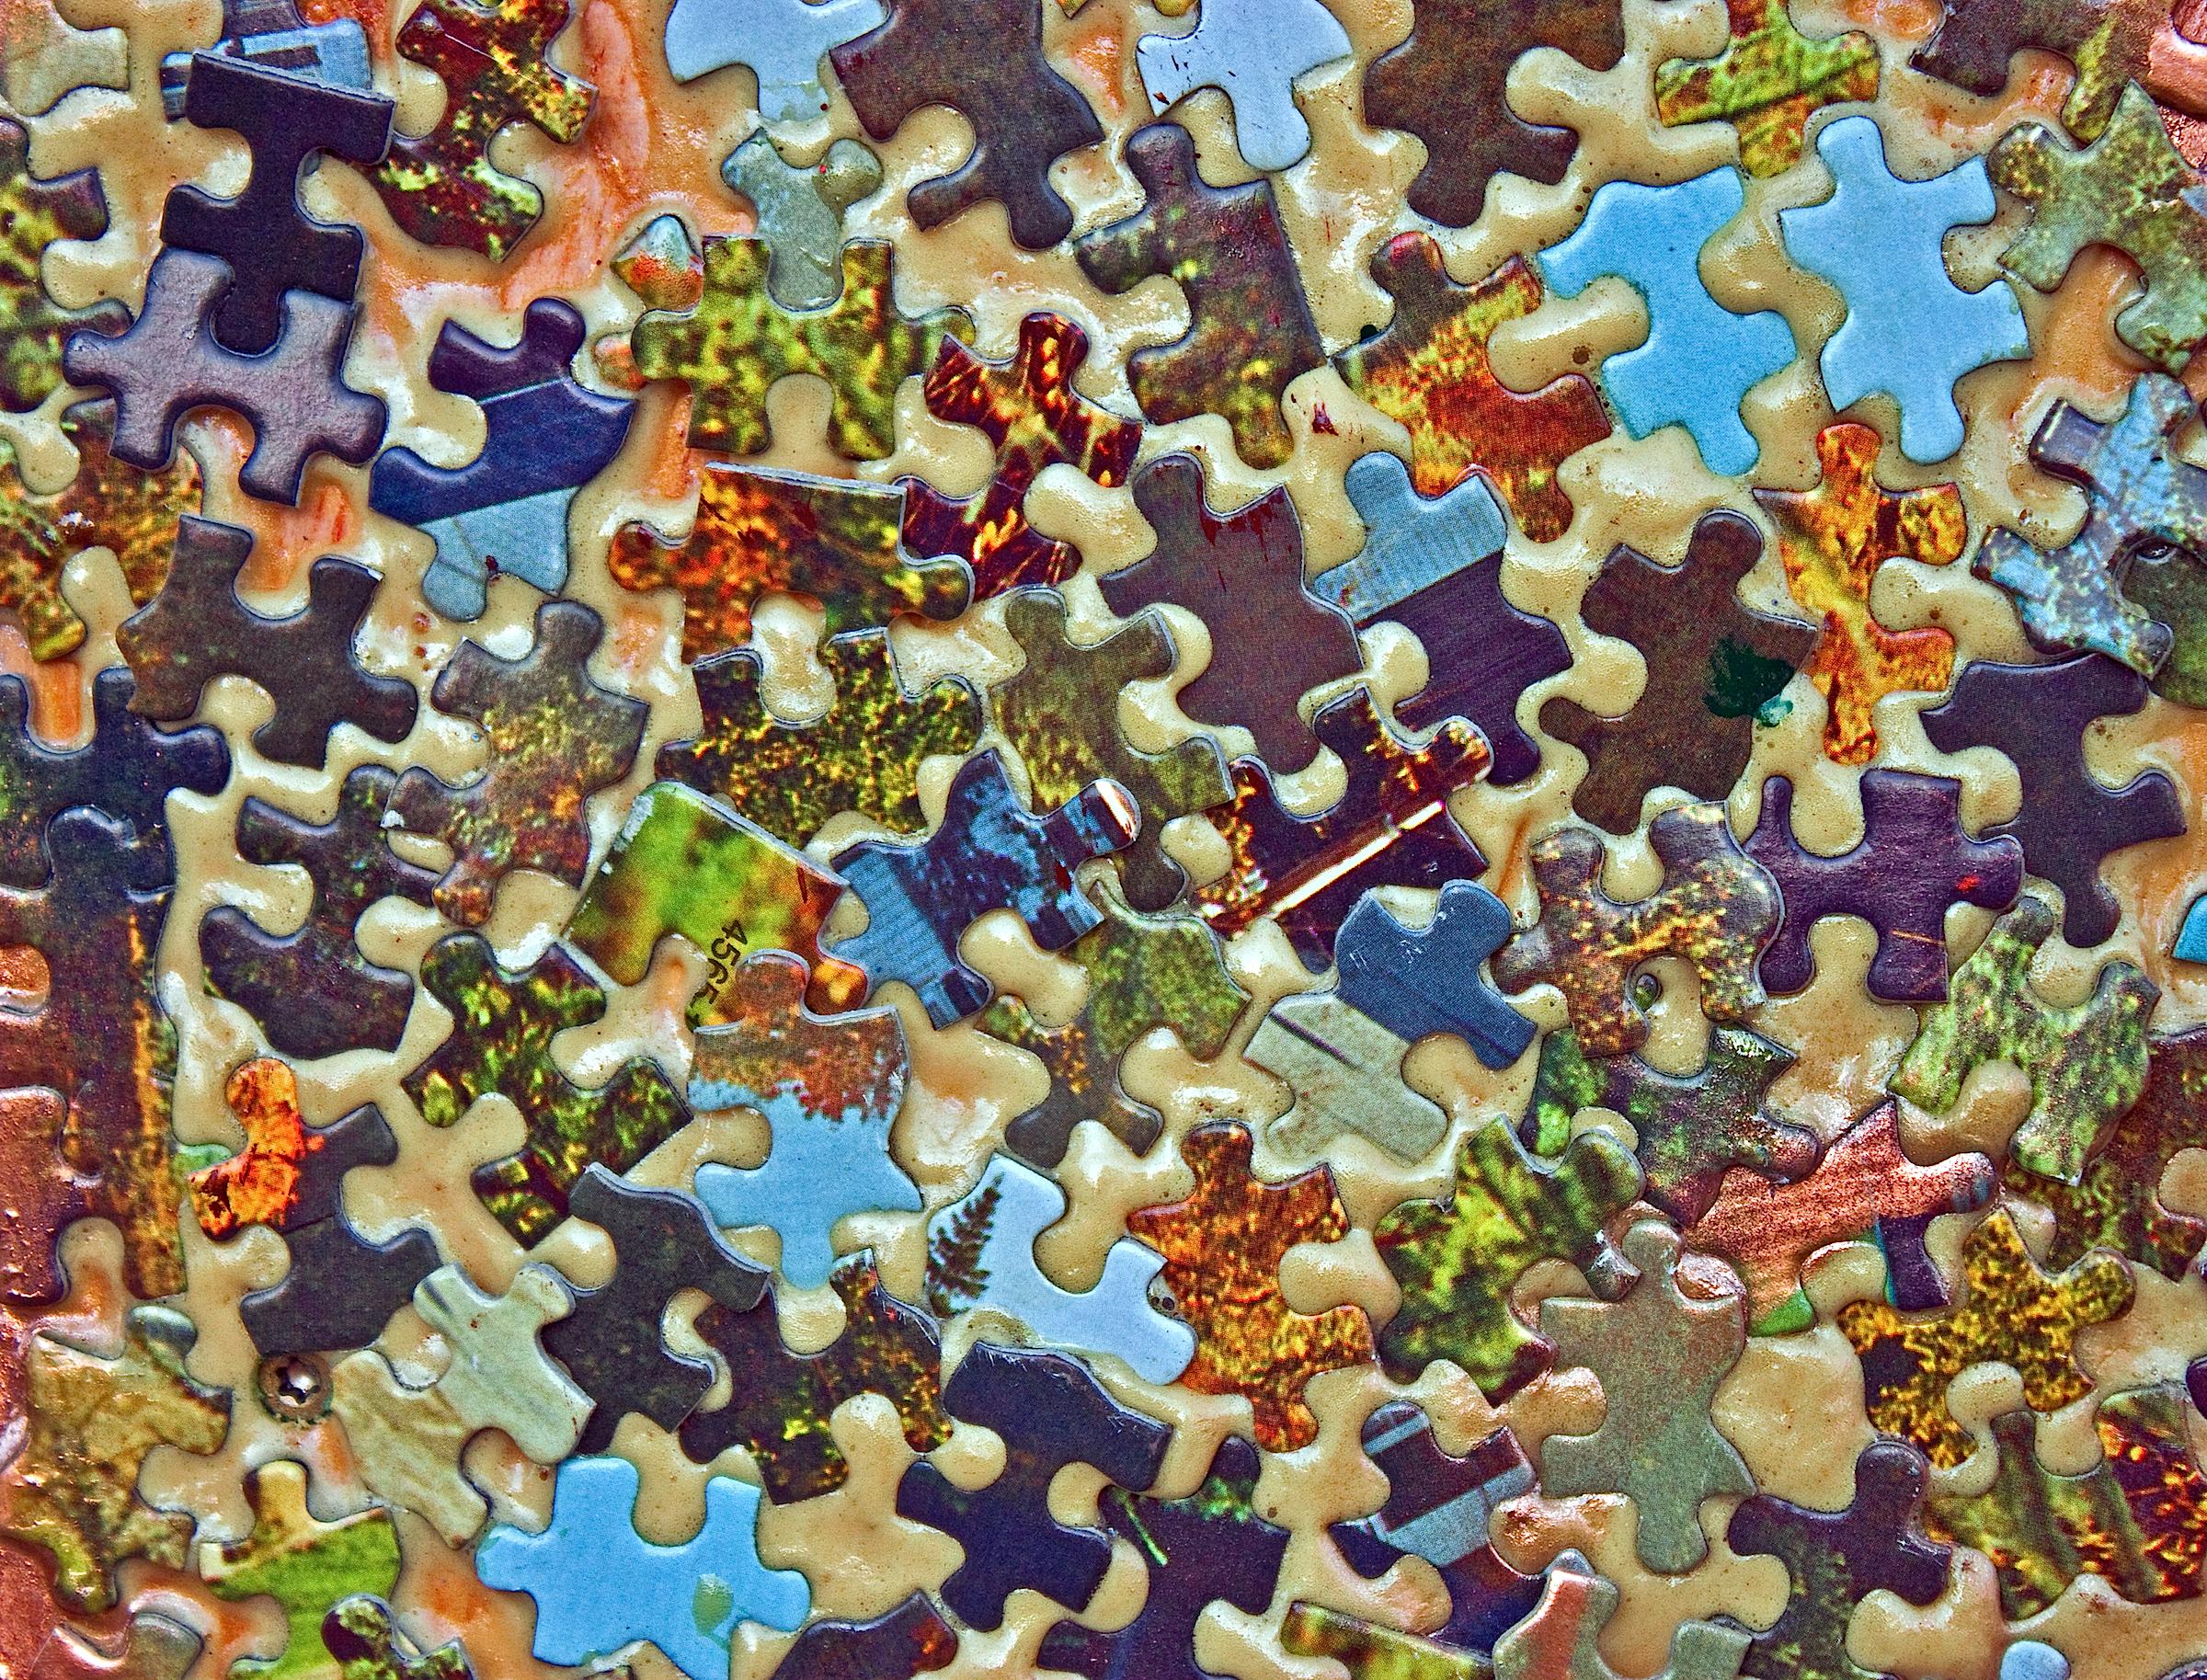 file jigsaw when art imitates life 8164506694 jpg wikimedia